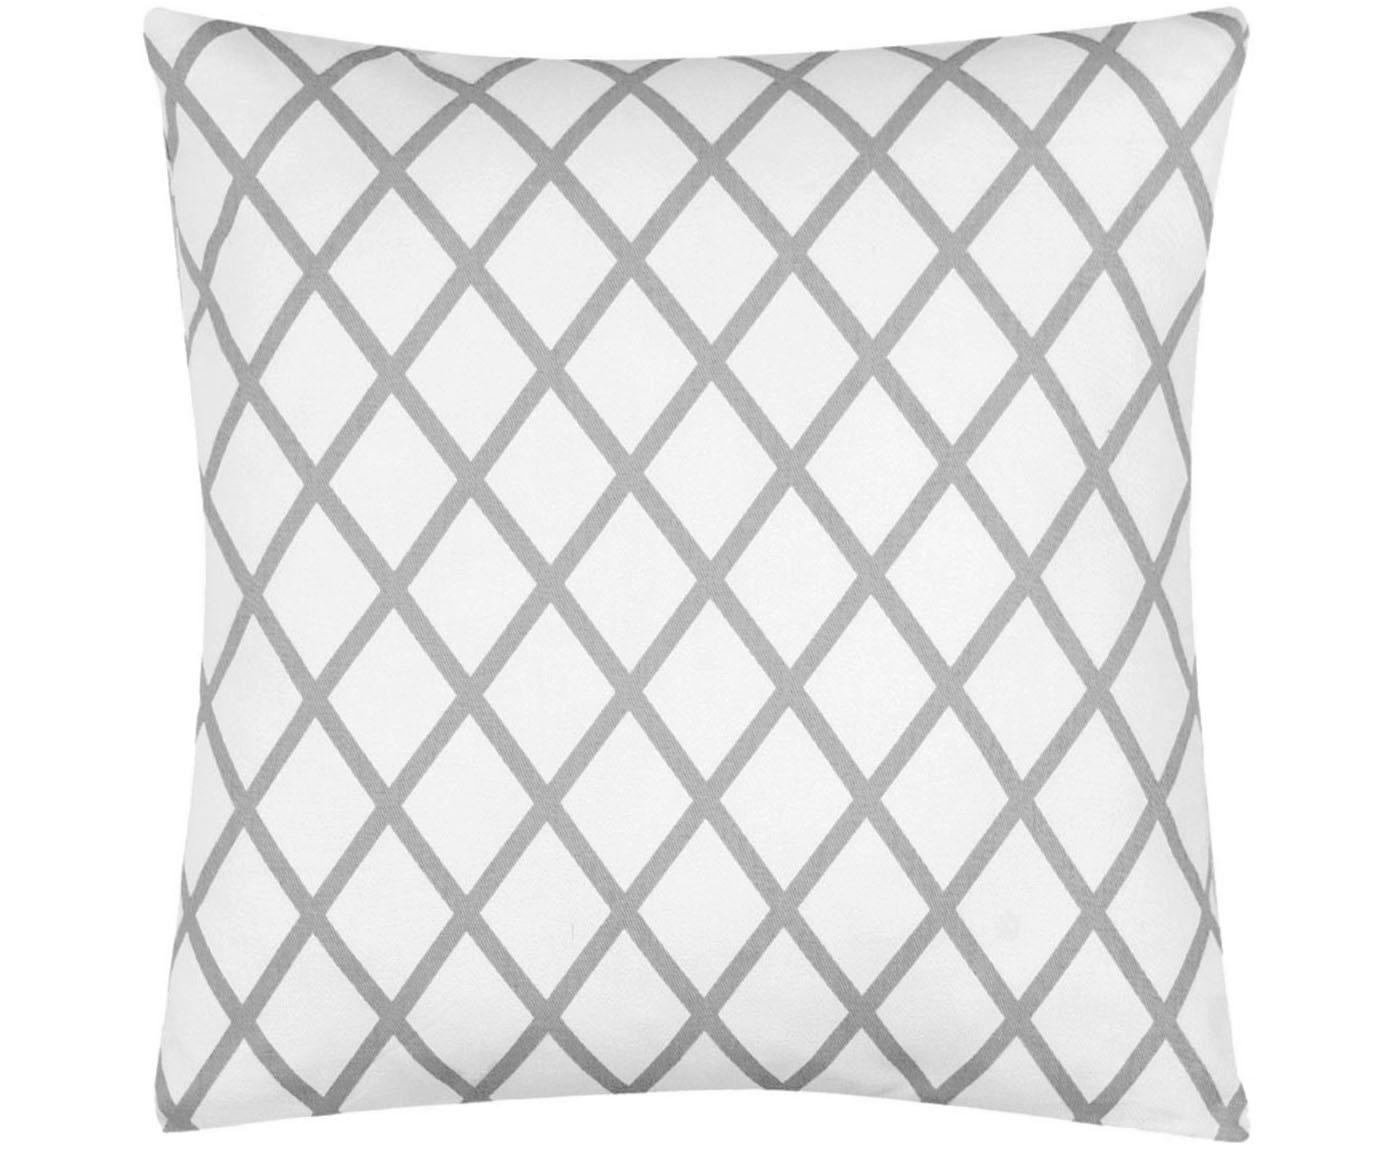 Kissenhülle Romy mit Rautenmuster in Grau/Weiß, 100% Baumwolle, Panamabindung, Grau, Creme, 40 x 40 cm